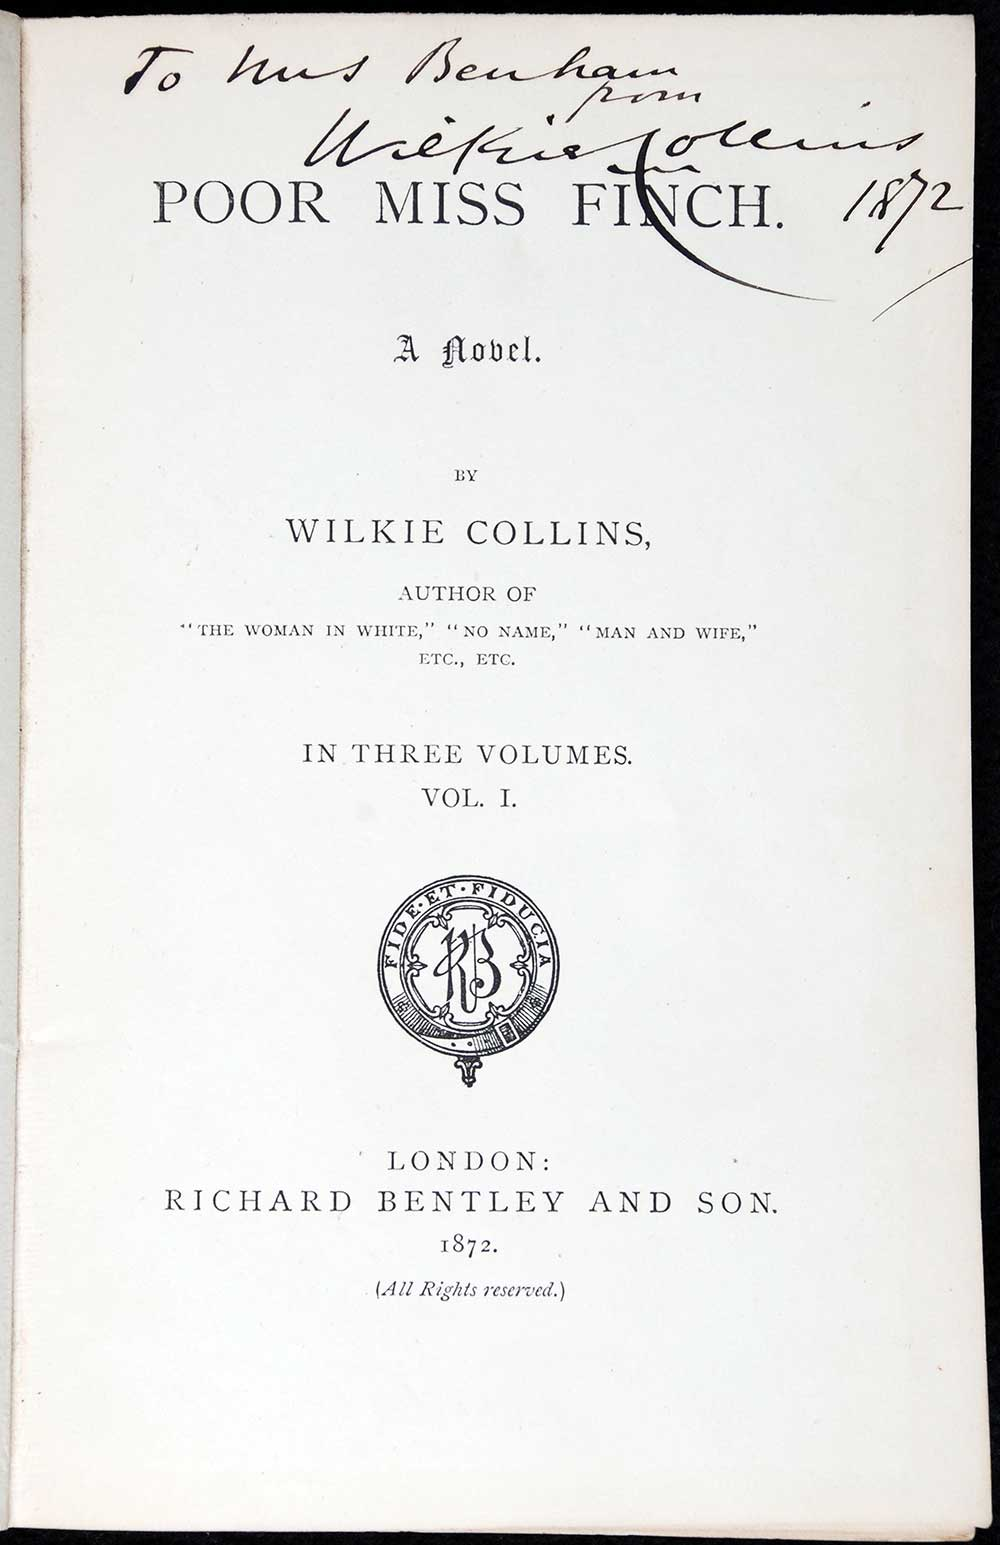 Wilkie Collins. <em>Poor Miss Finch: a novel</em>. London: Richard Bentley, 1872. Three volumes; Vol. 1 displayed.